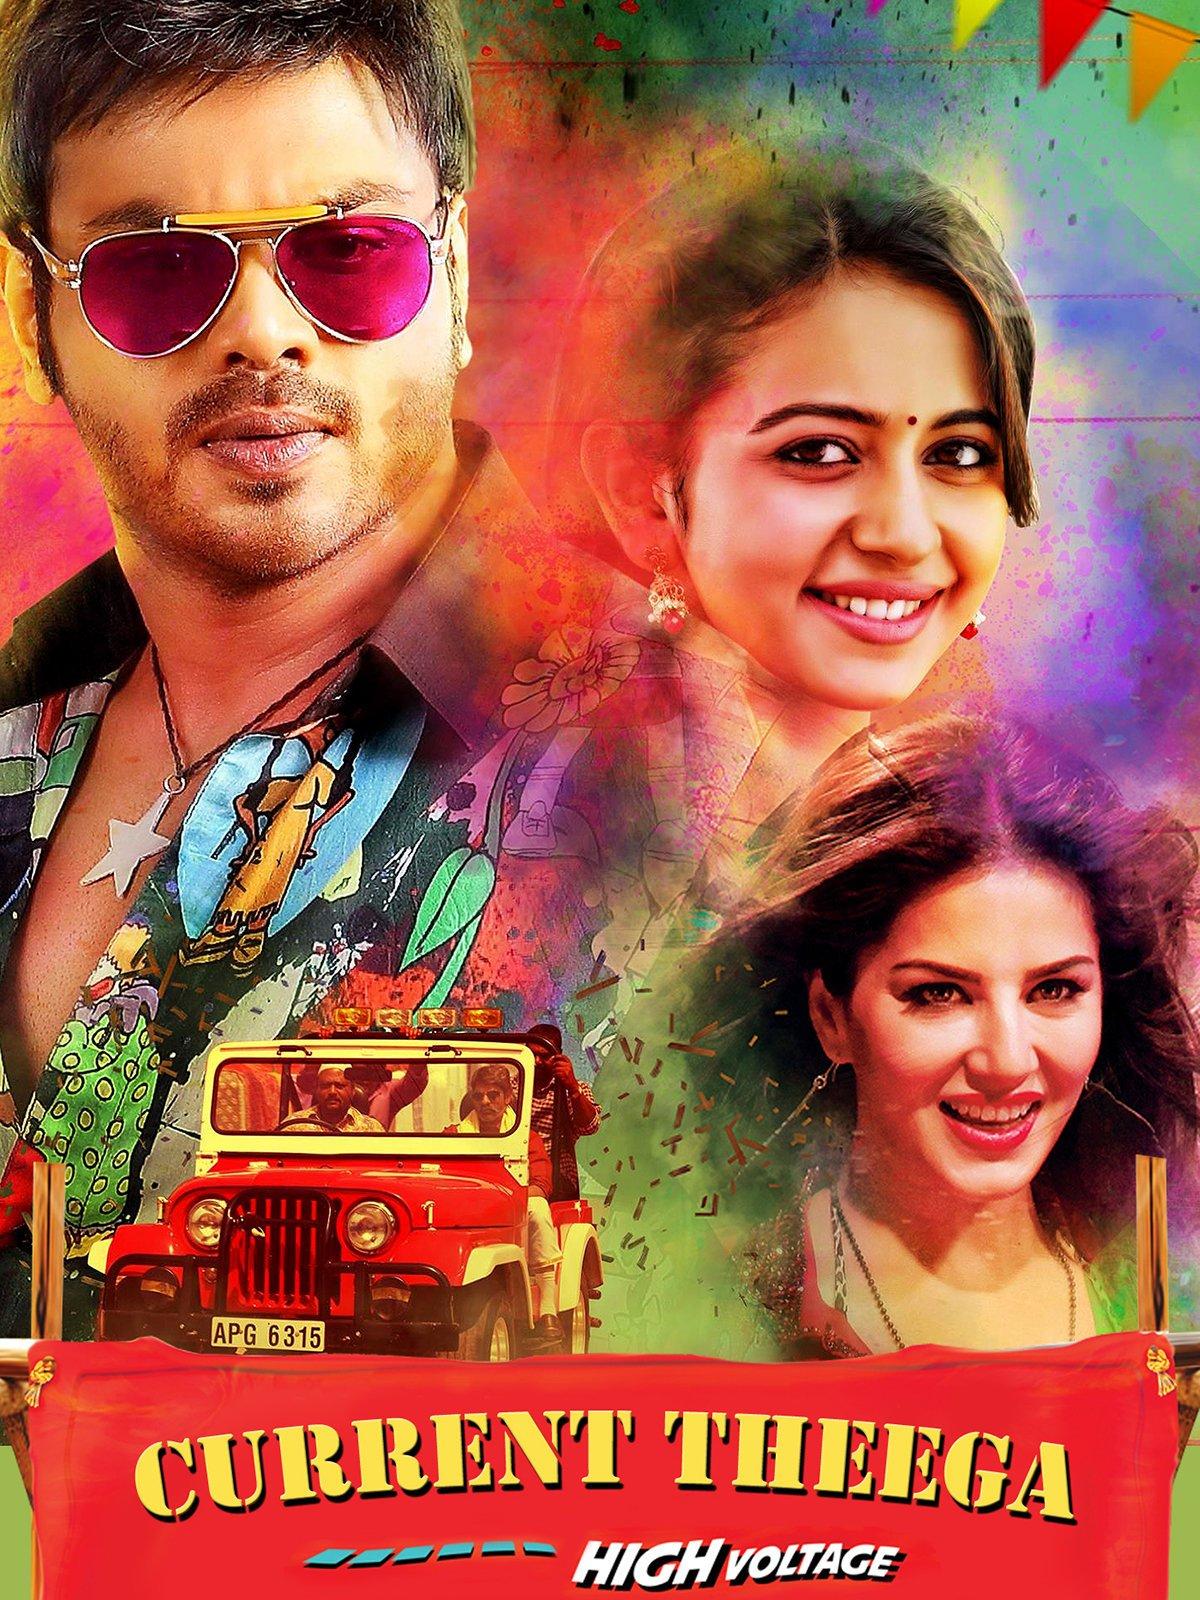 Current Theega (2021) Hindi Dubbed Movie HDRip 720p AAC